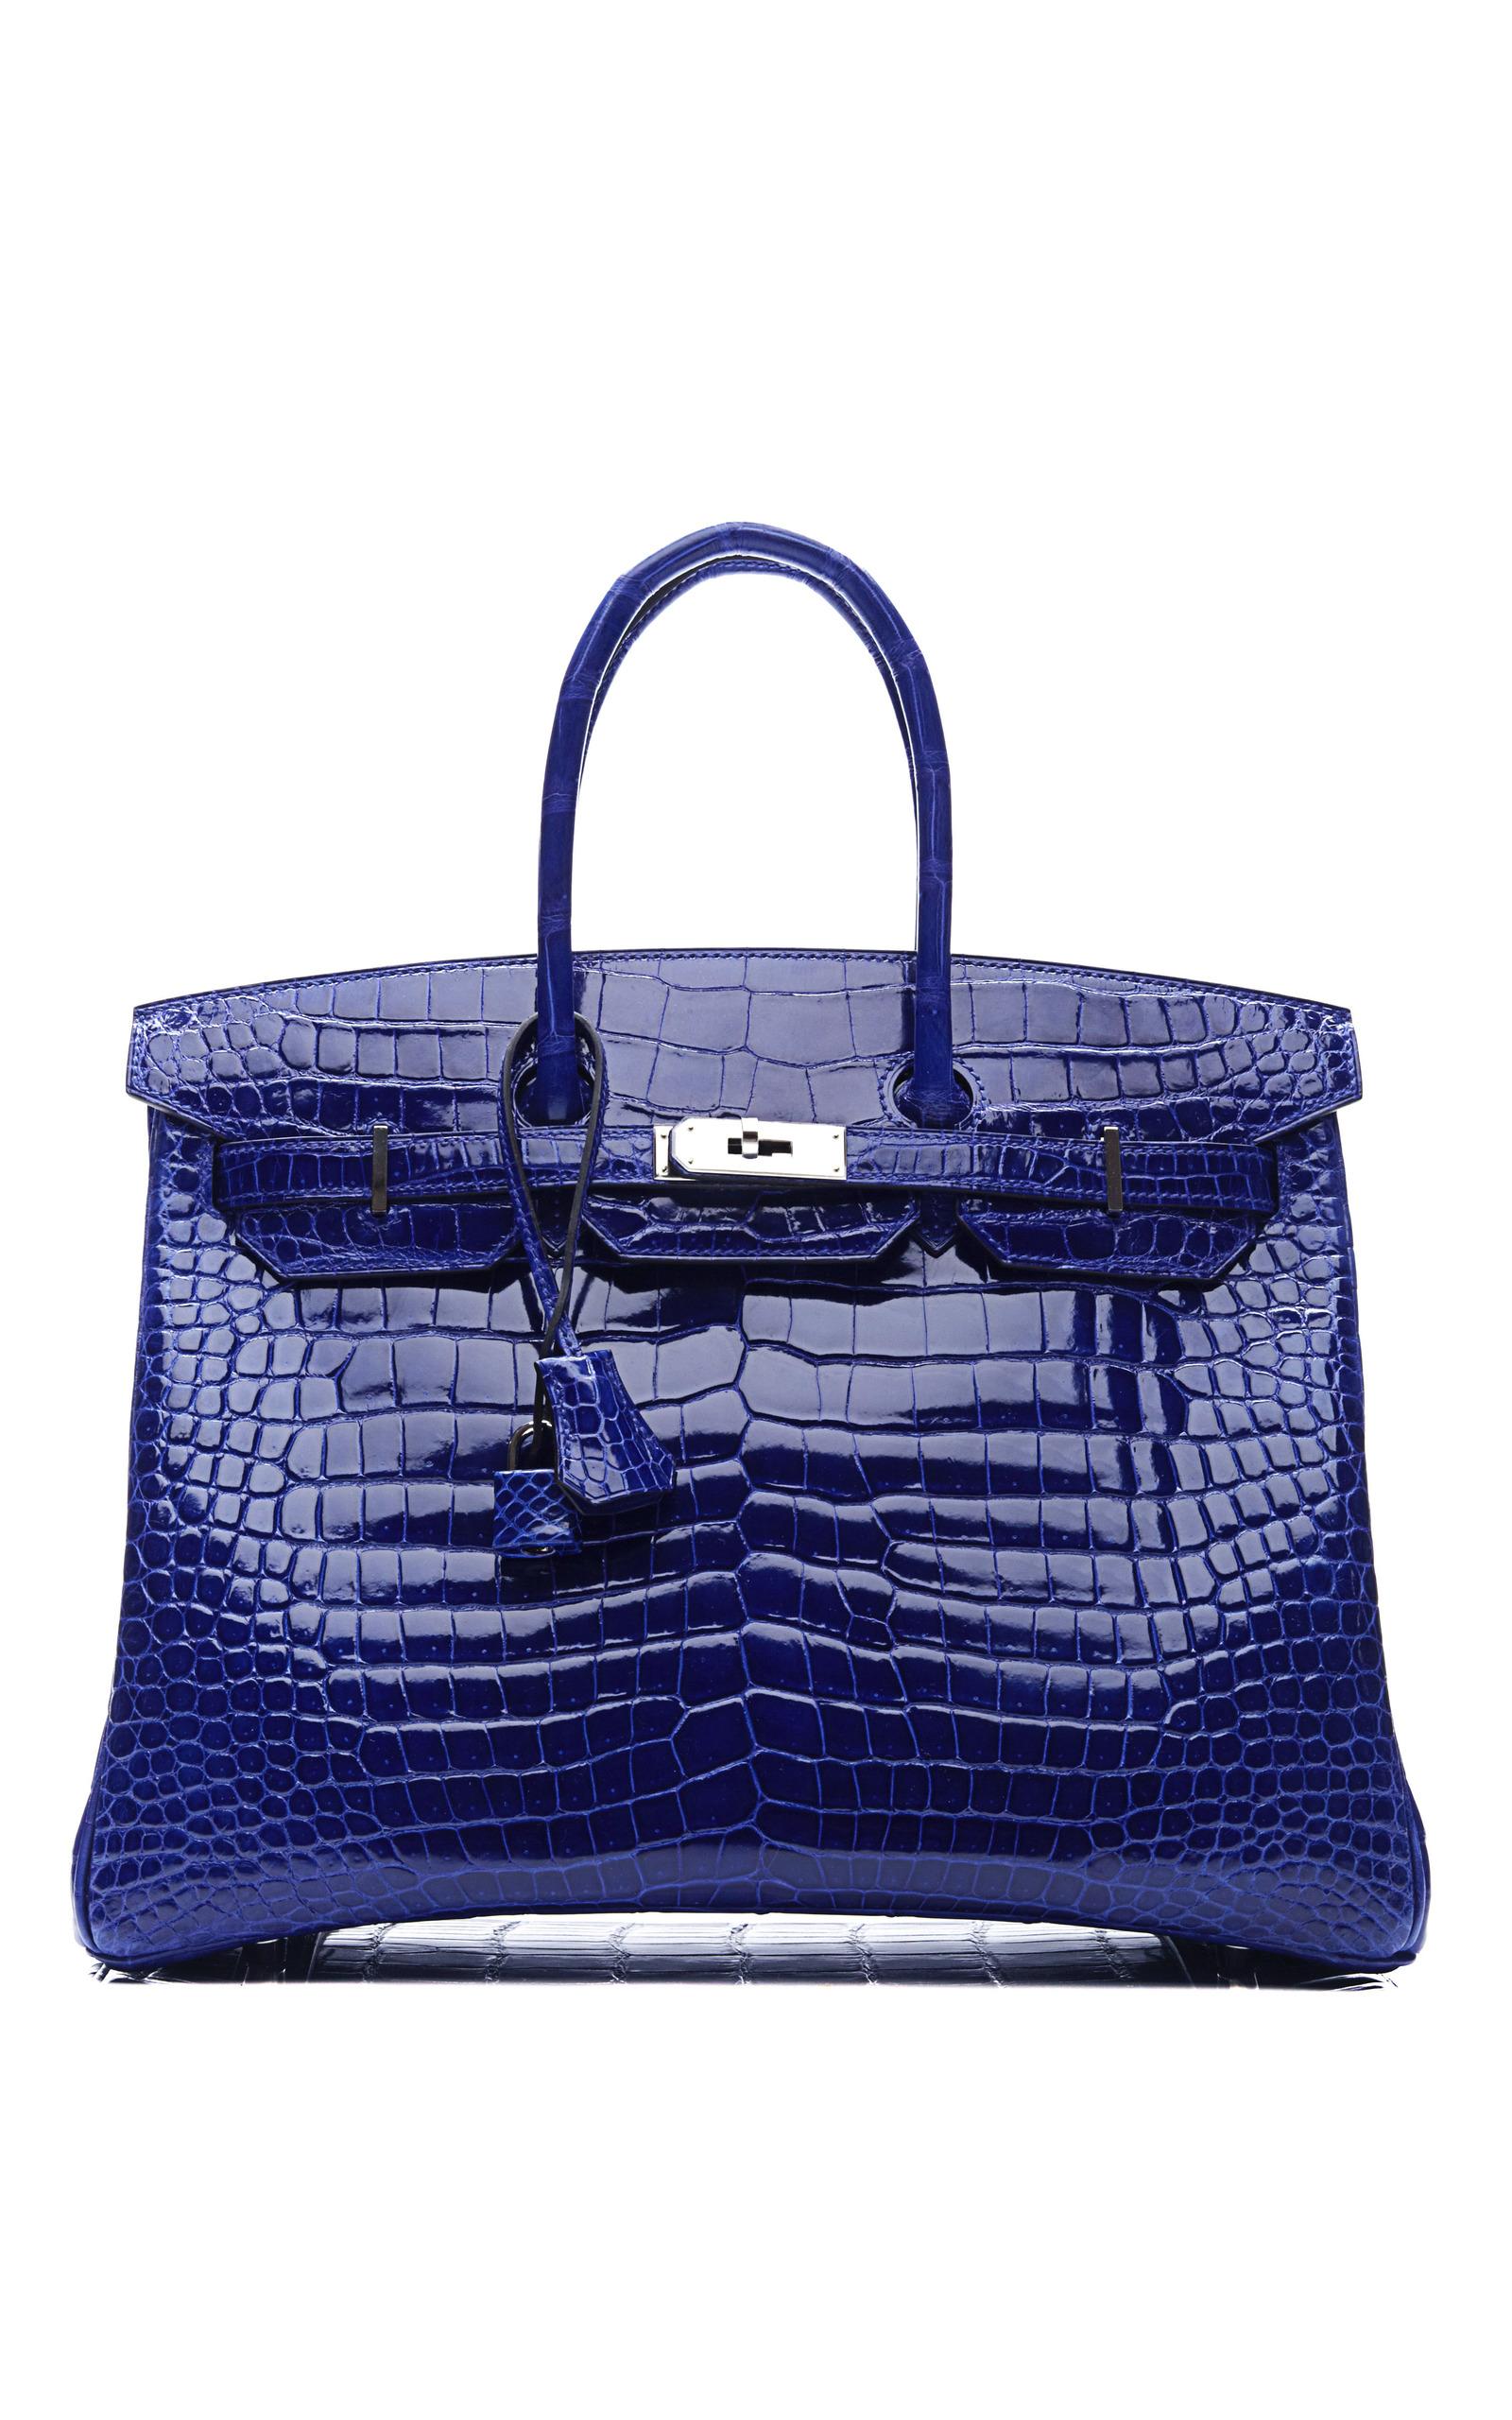 fc88770a9499 Hermes Vintage35Cm Shiny Electric Blue Porosus Crocodile Birkin. CLOSE.  Loading